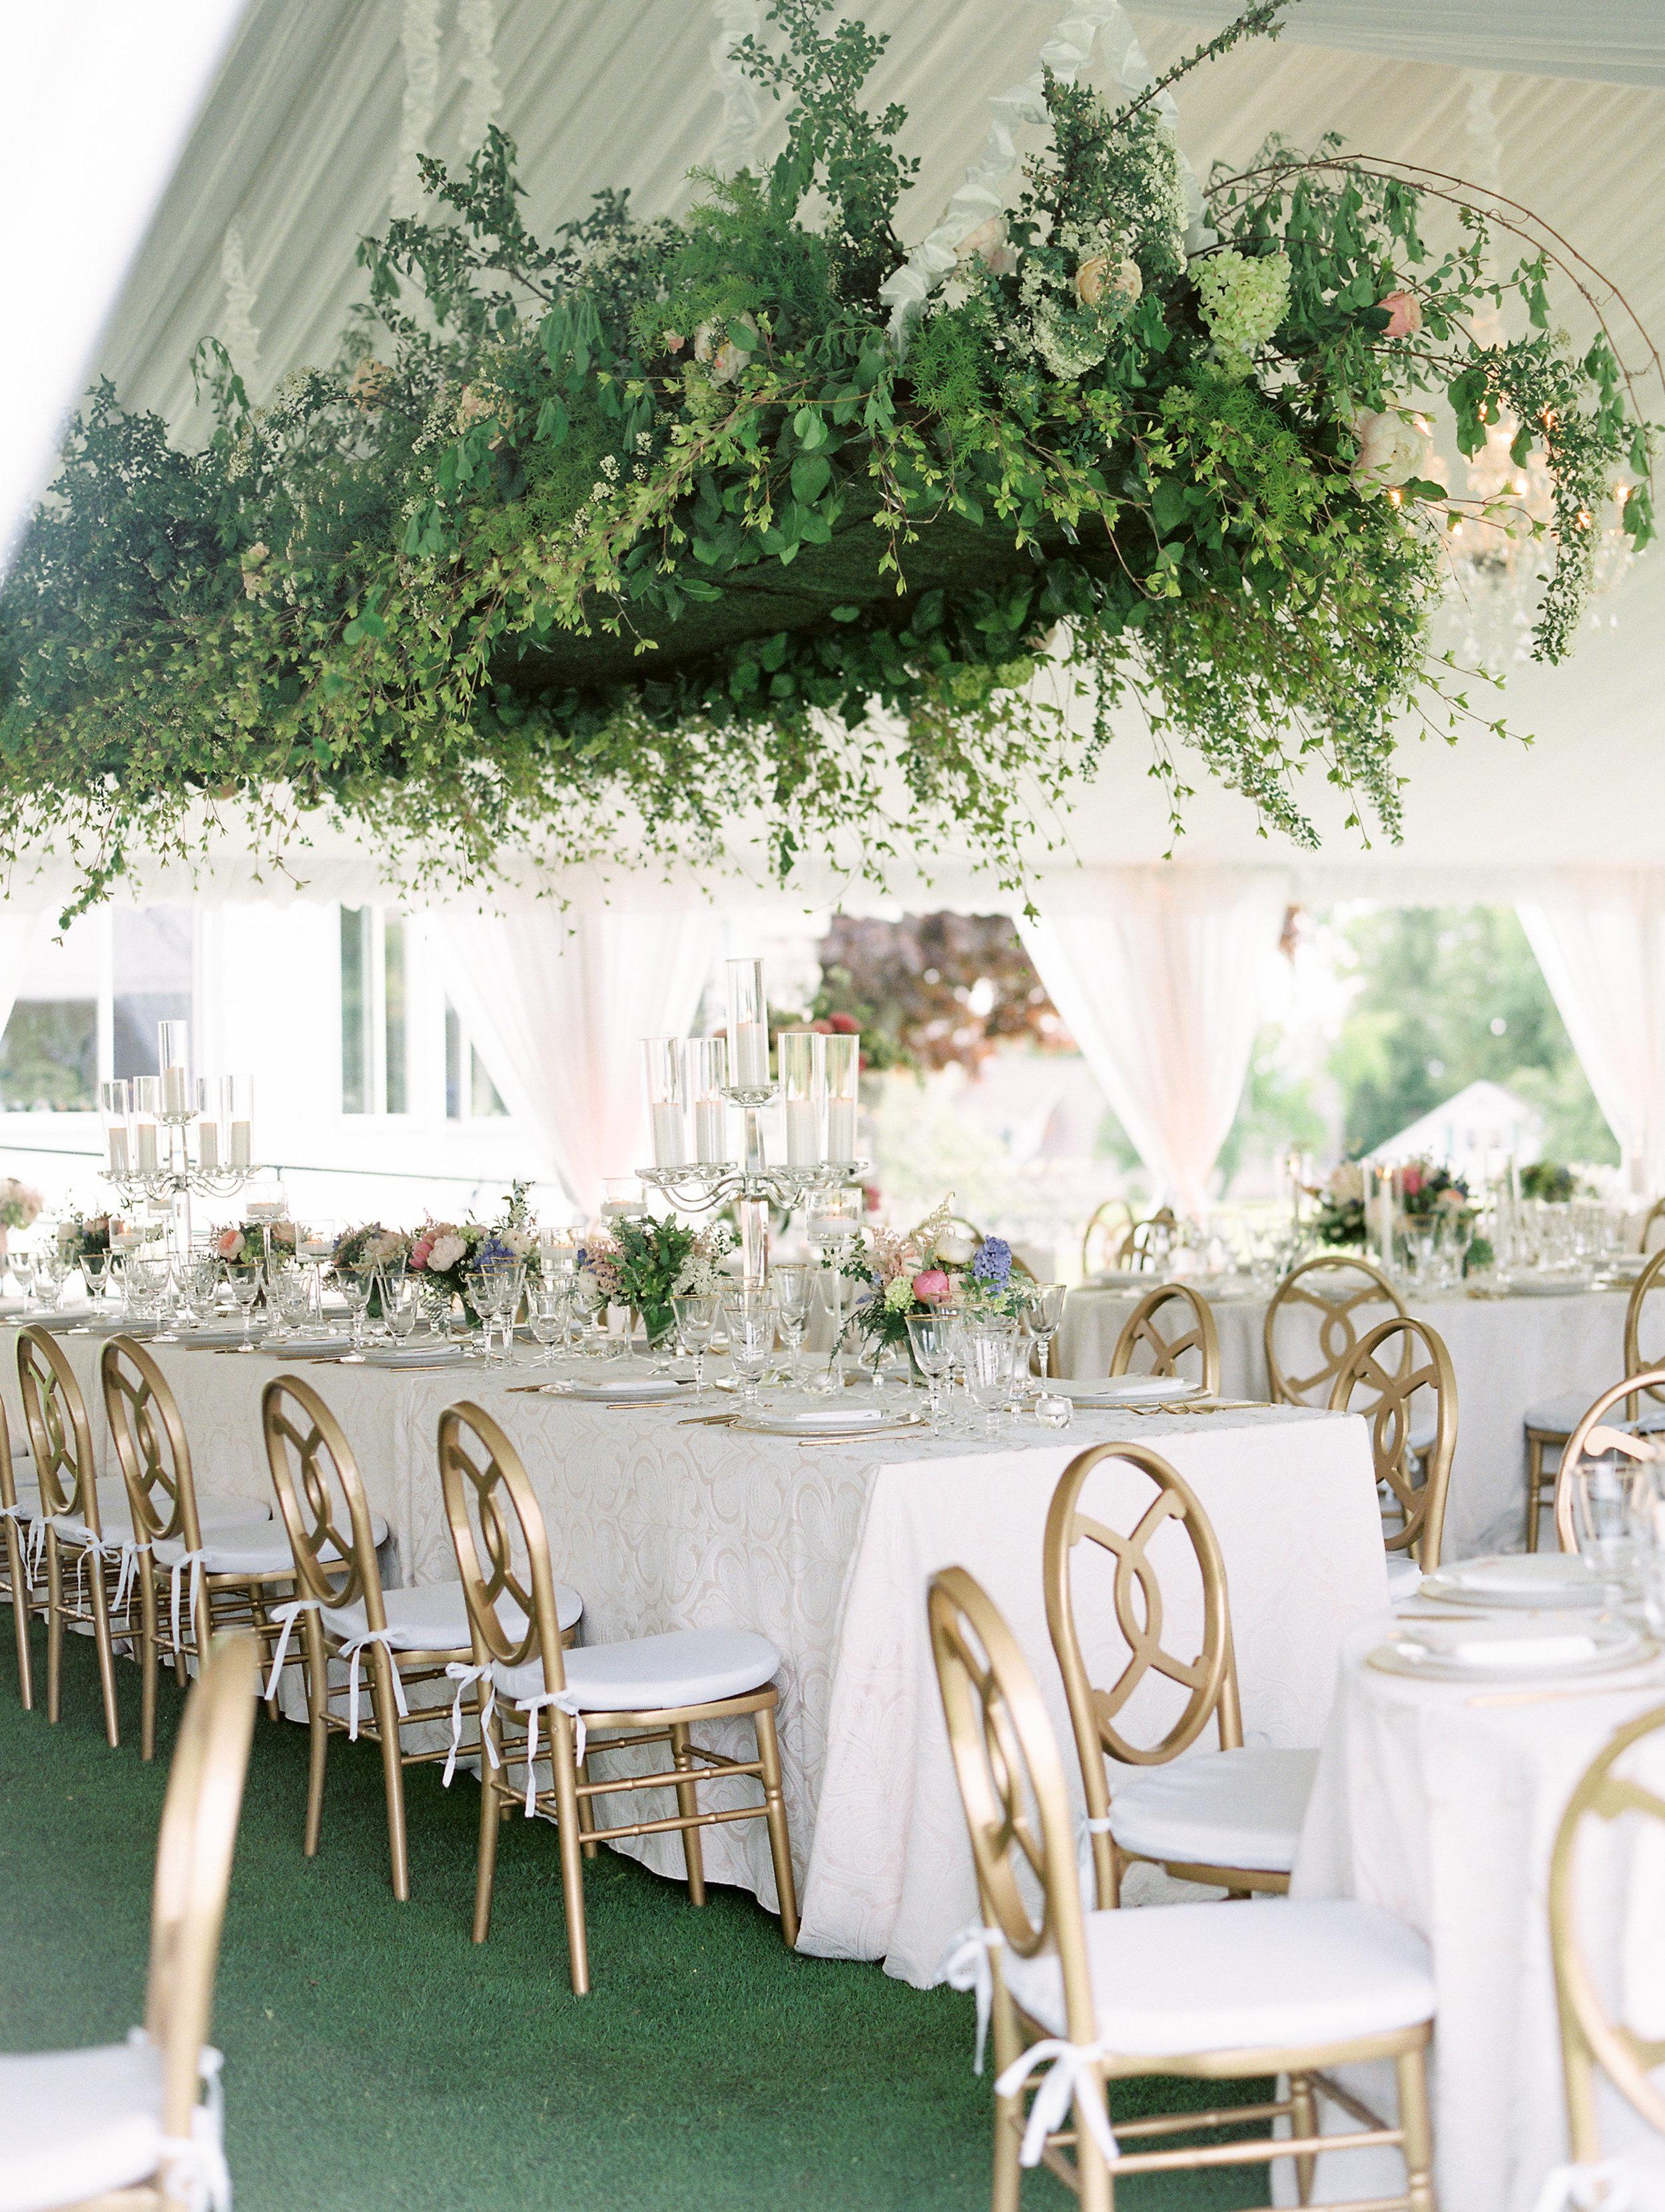 Coffman+Wedding+Reception+Details-73.jpg